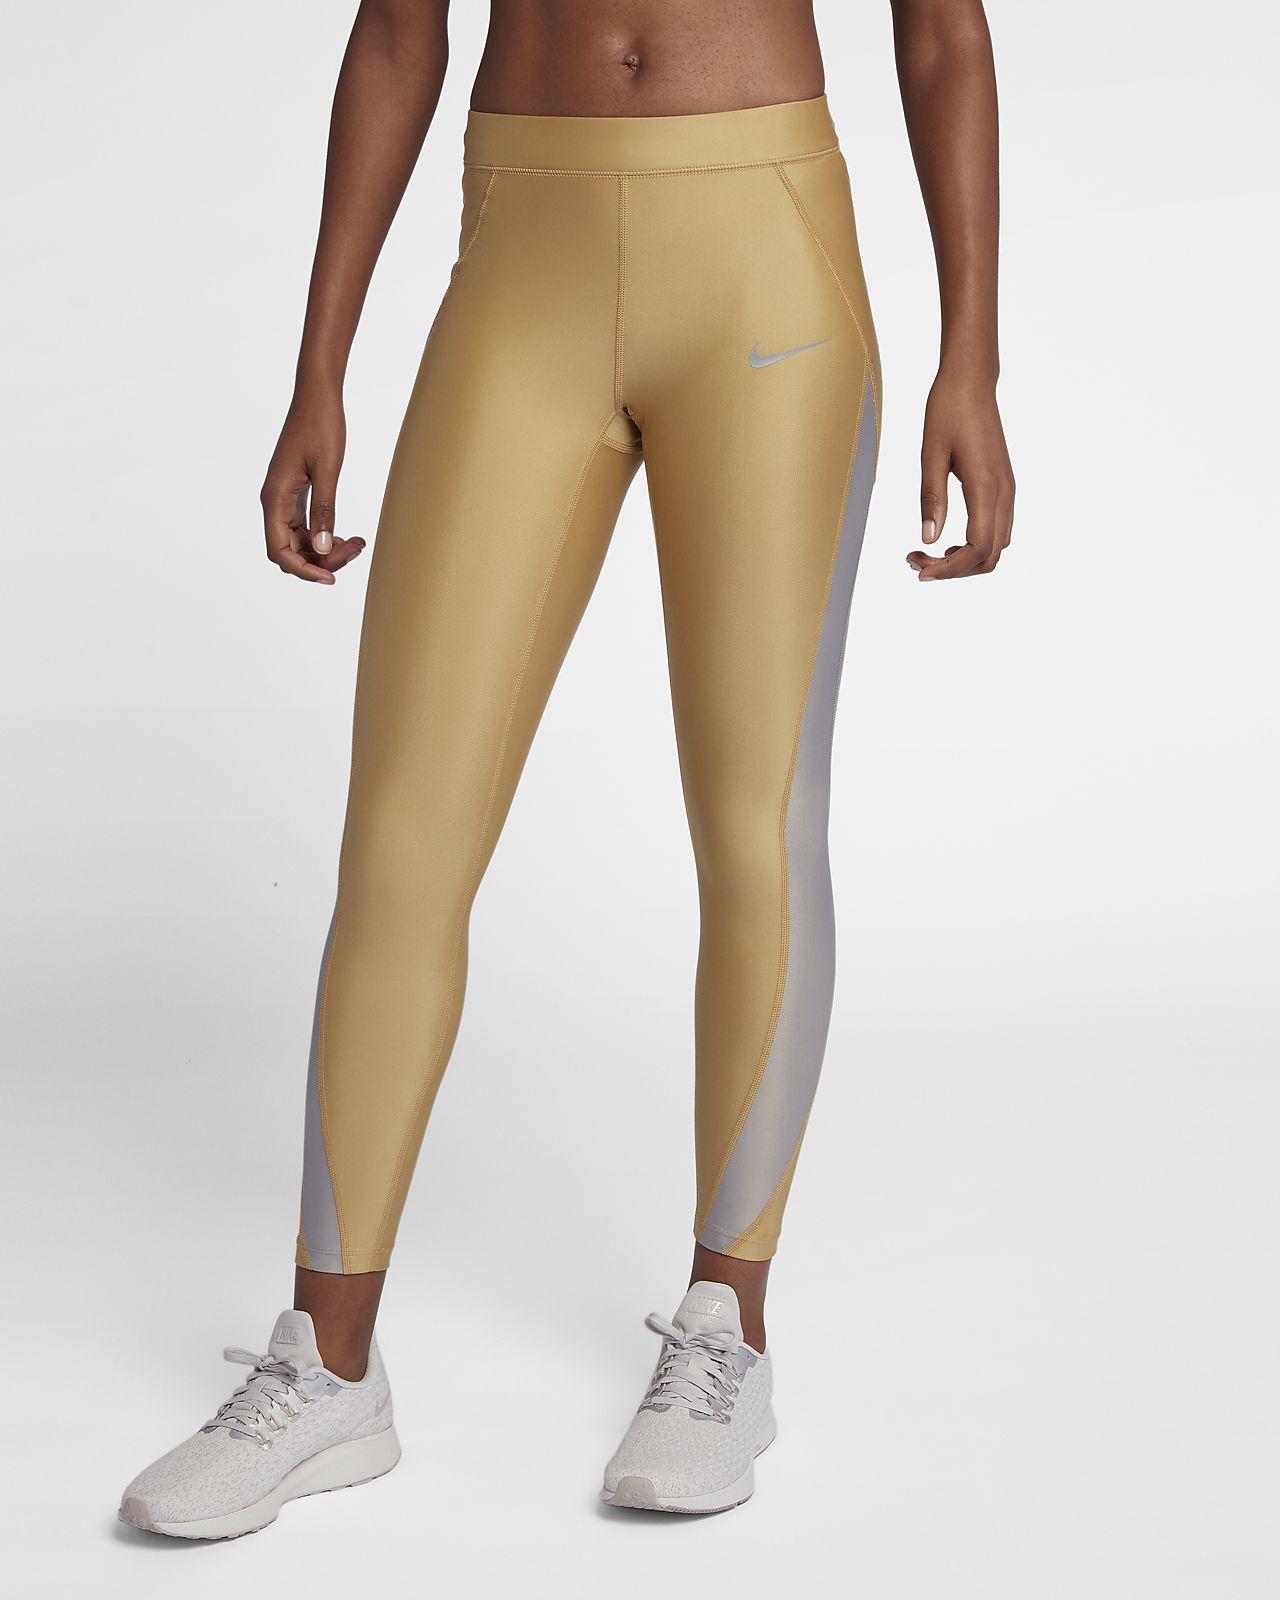 Nike Speed Metallic 7/8-hardlooptights met halfhoge taille voor dames